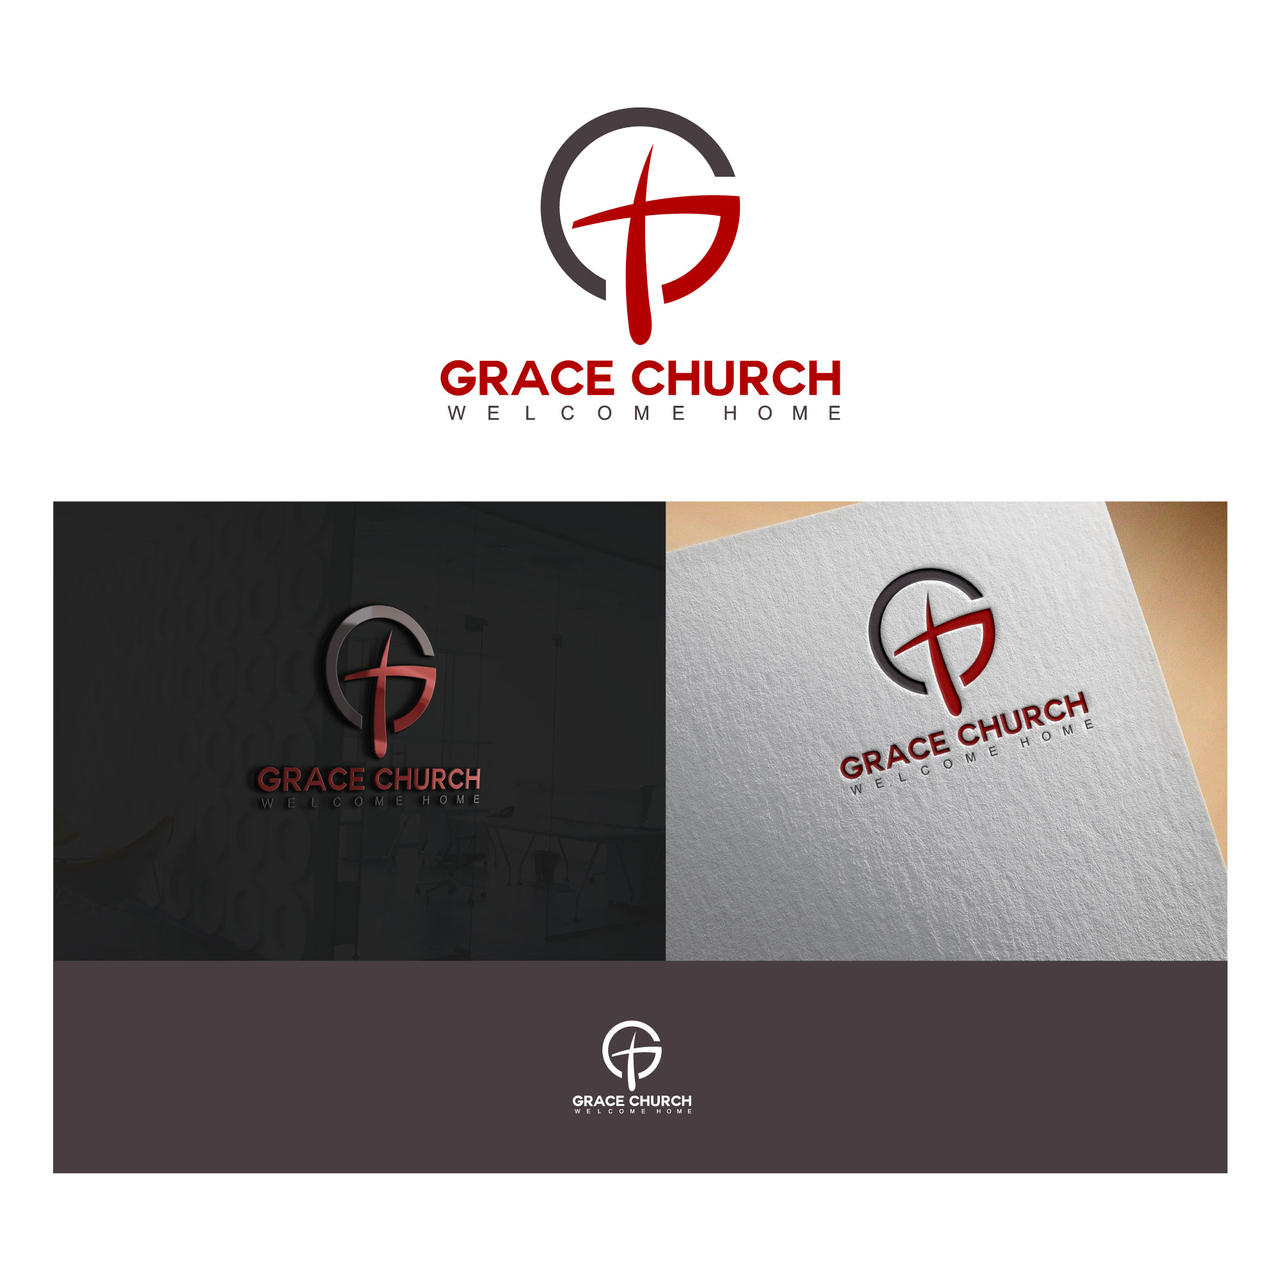 Church Logo Ideas by annecarton on DeviantArt